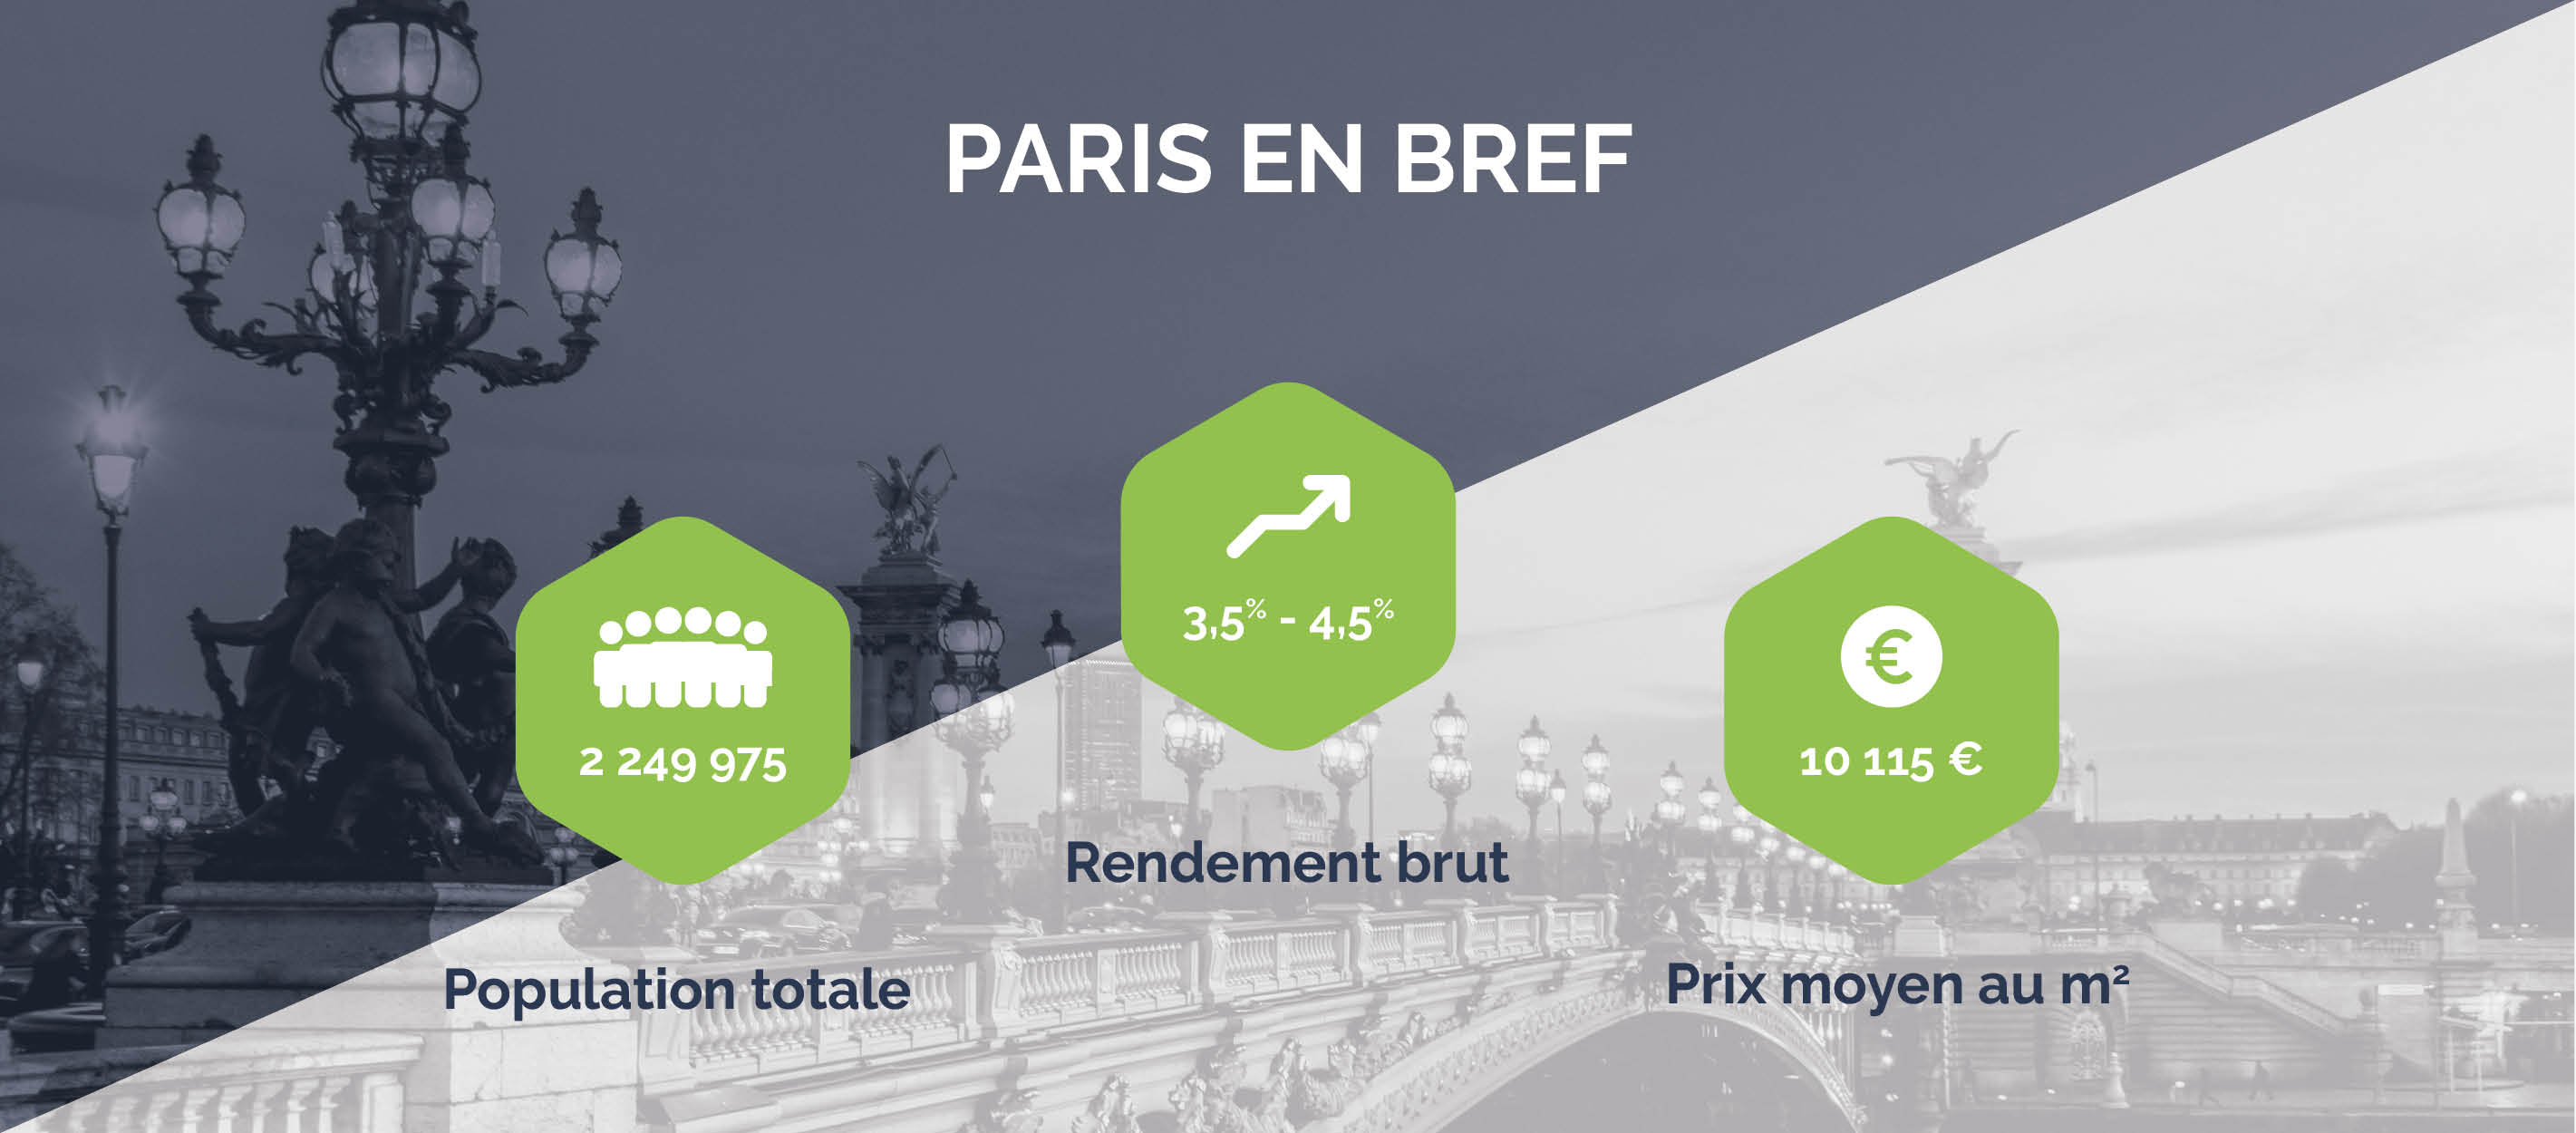 PARIS_PARIS EN BREF-1